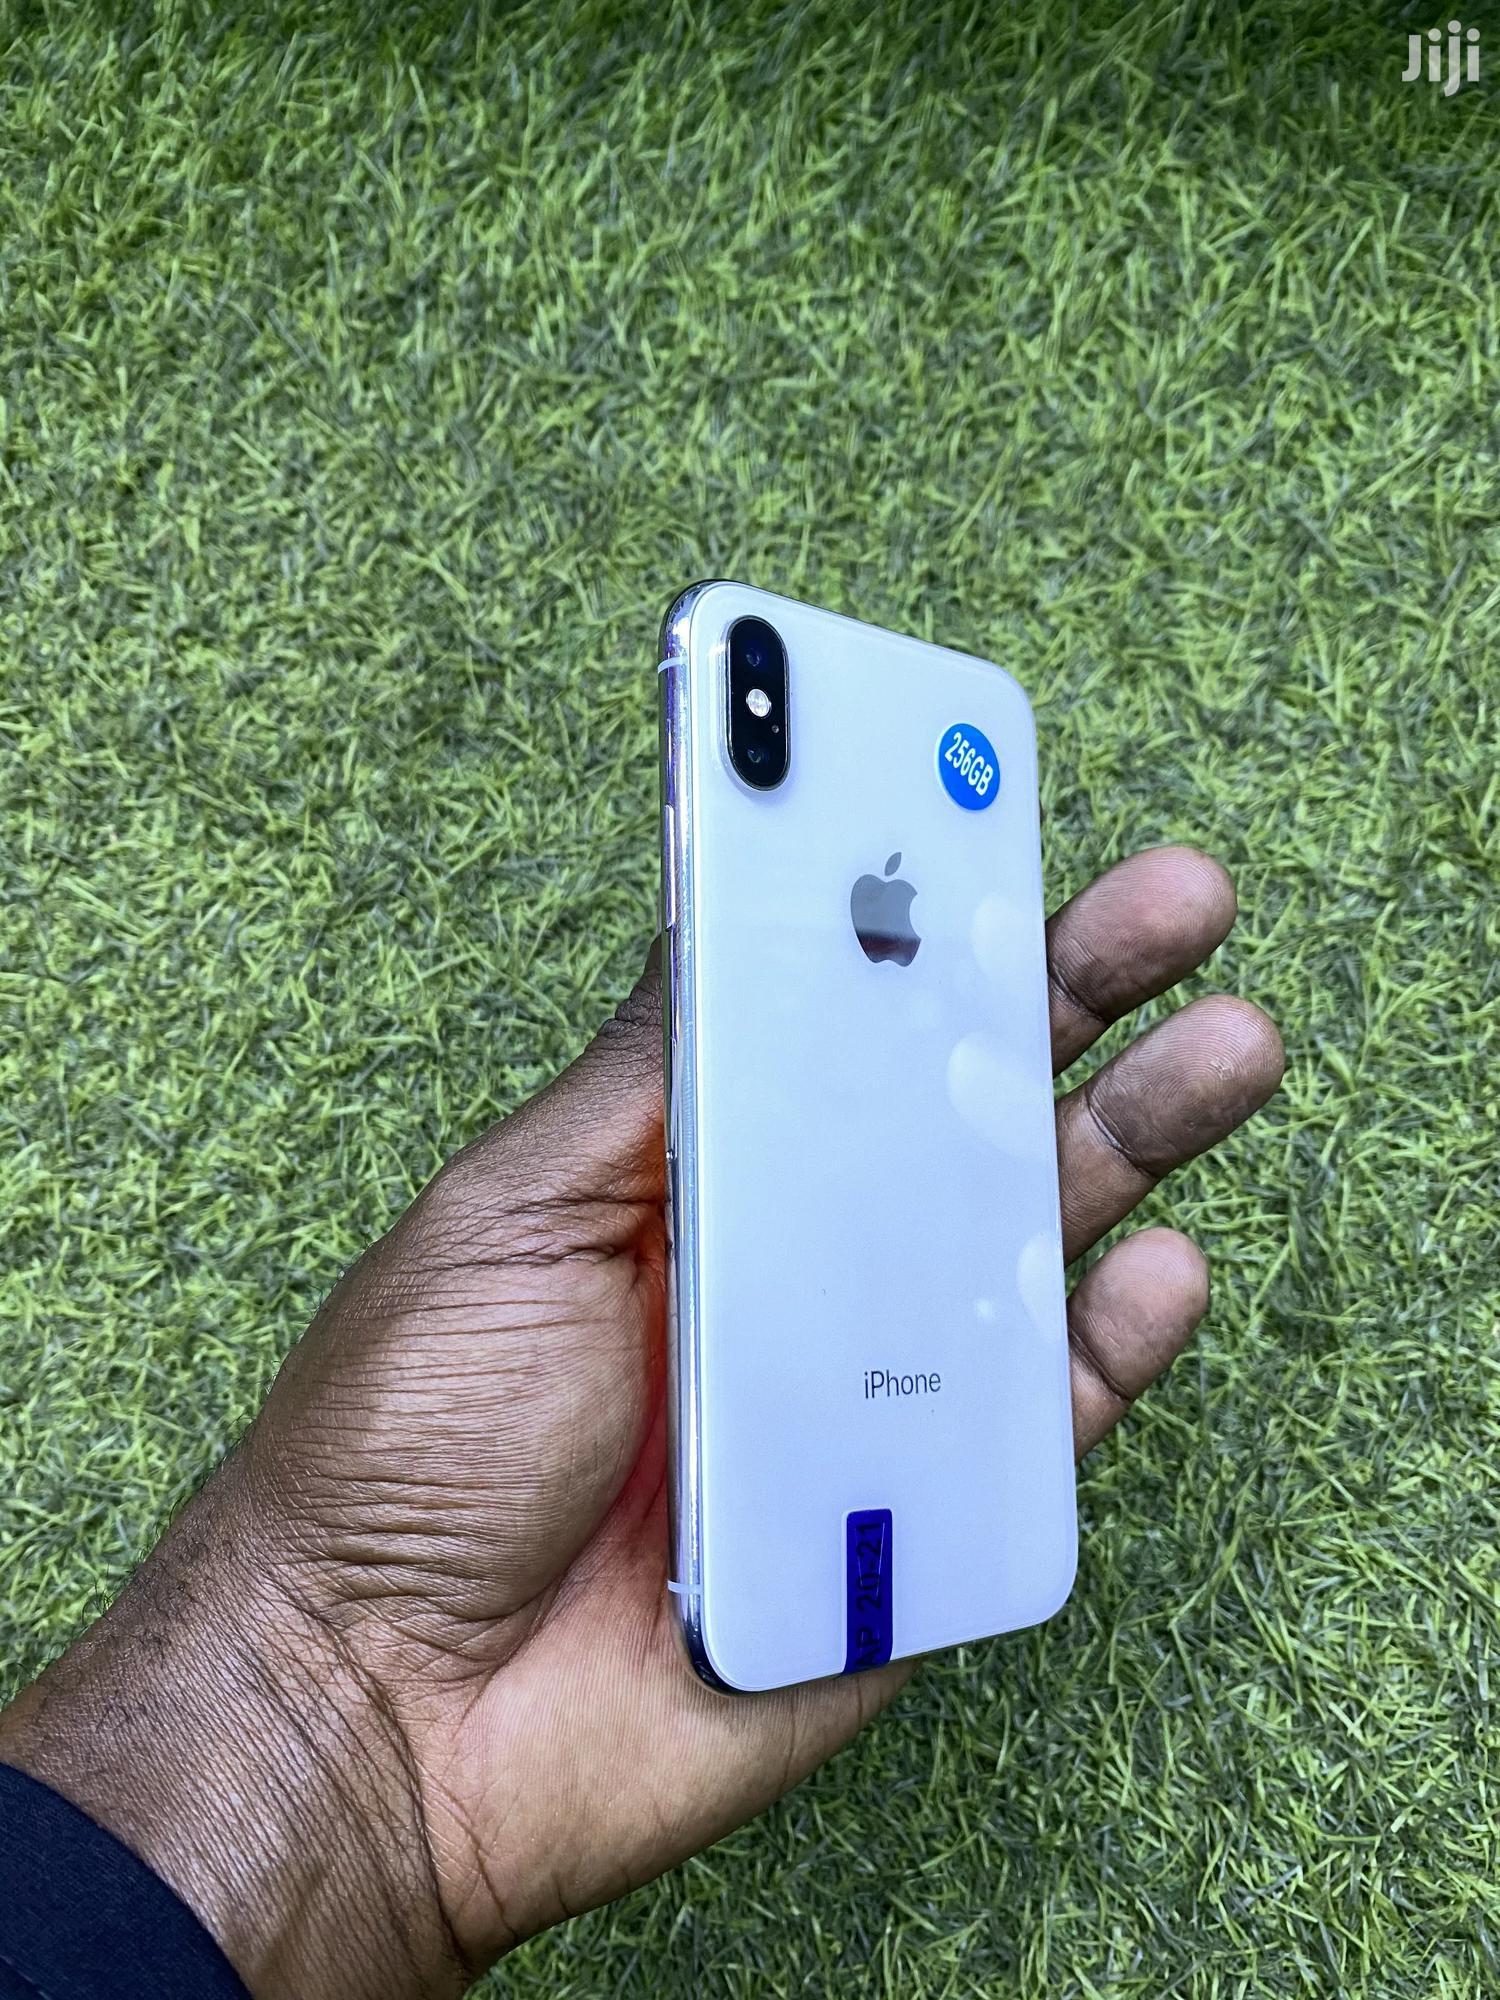 New Apple iPhone X 256 GB White | Mobile Phones for sale in Kampala, Central Region, Uganda